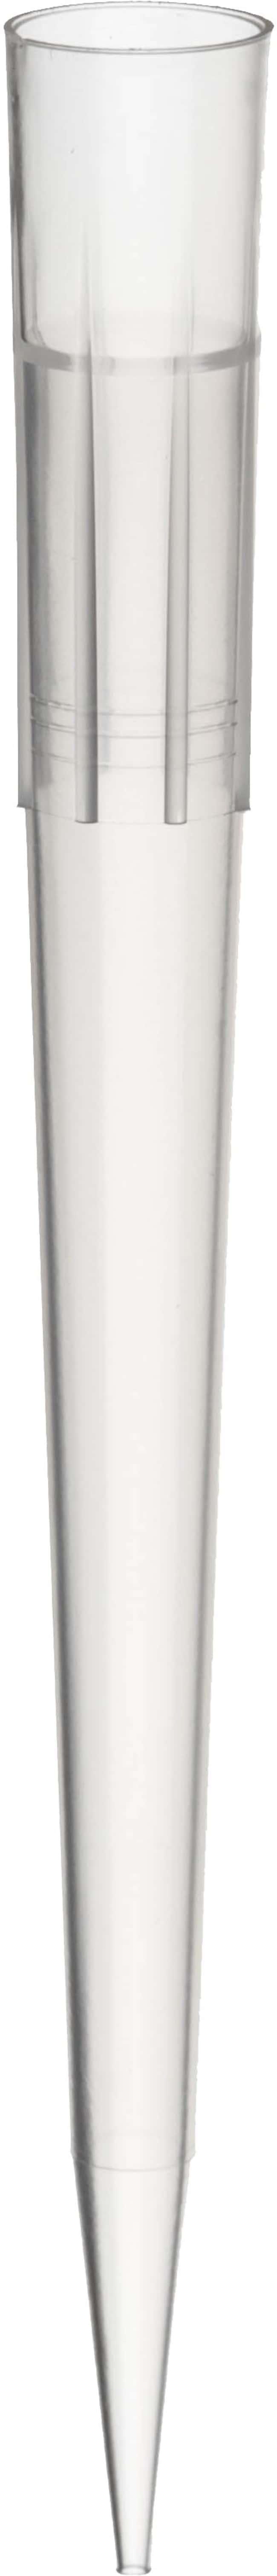 LabconEclipse™ 1200 μL Pipette Tips for Rainin™ LTS Pipettors 96 tips/rack; 6 racks/pk.; 8 pk./case; Non-sterile LabconEclipse™ 1200 μL Pipette Tips for Rainin™ LTS Pipettors